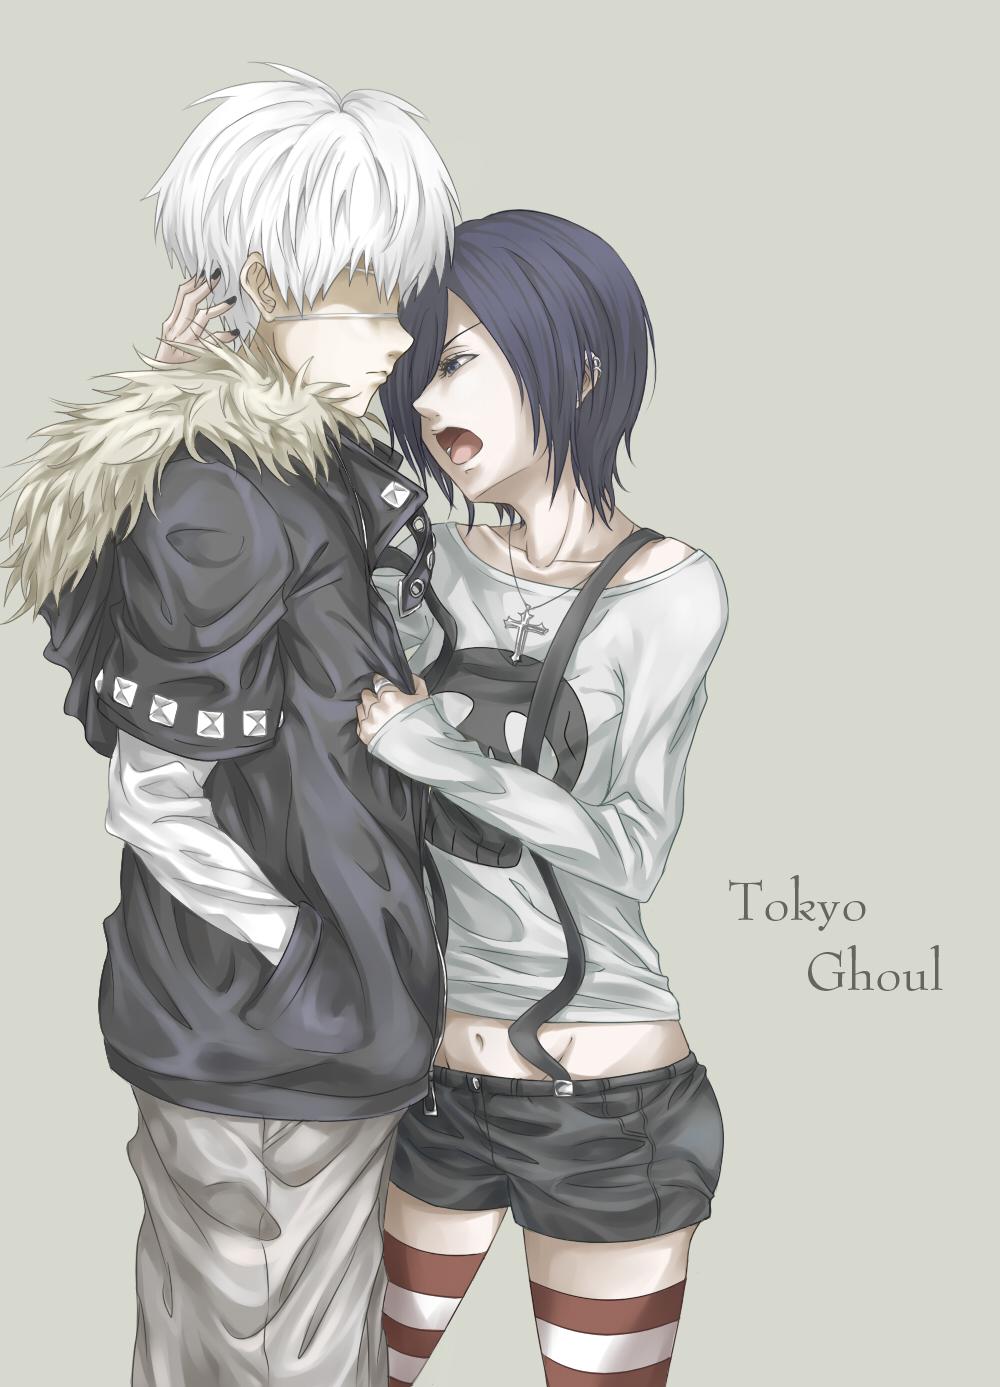 Tokyo Ghoul Mobile Wallpaper 1815973 Zerochan Anime Image Board